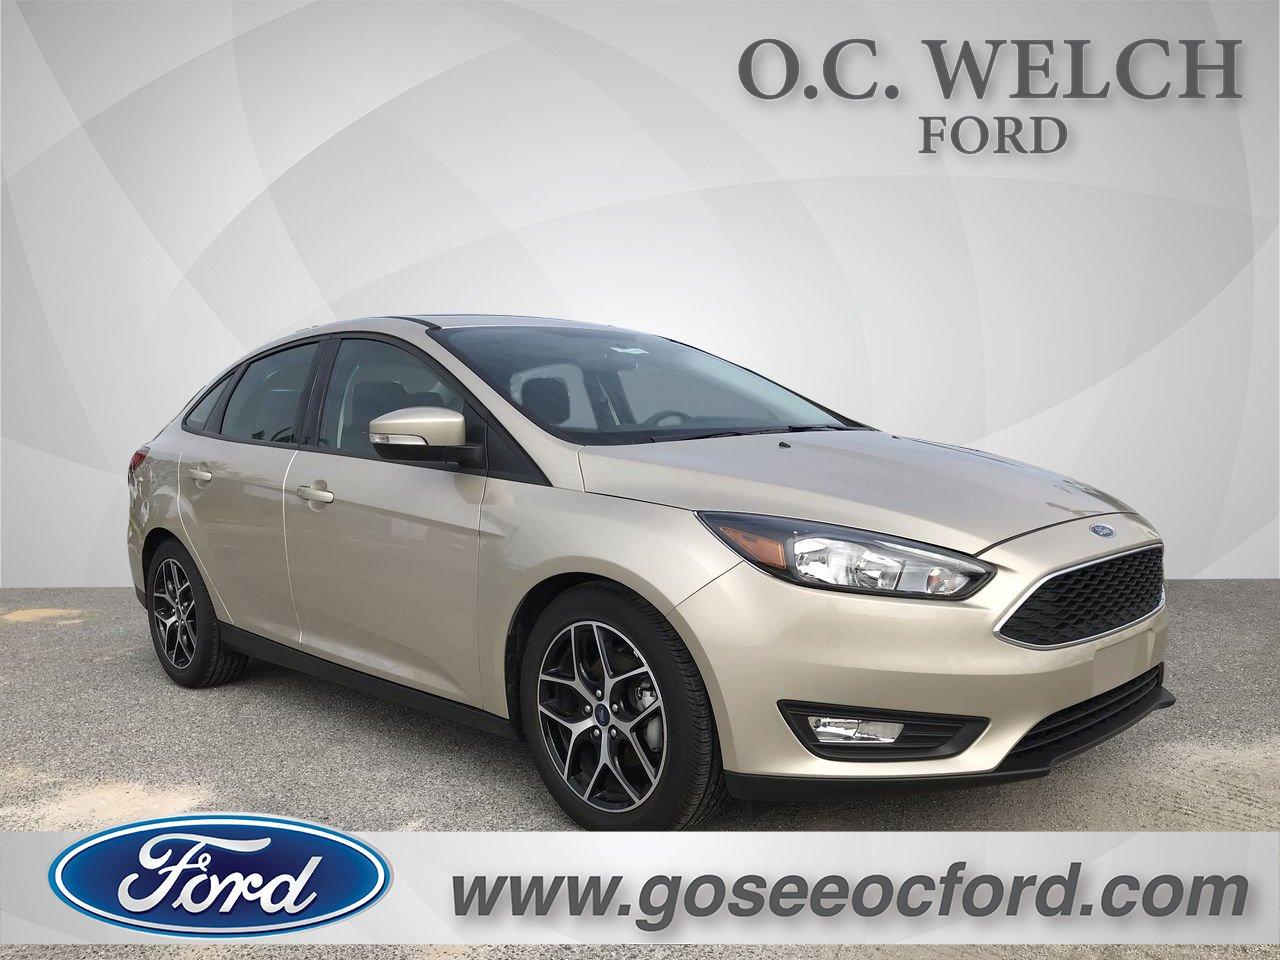 Used 2018 Ford Focus SEL Sedan for sale in Hardeeville, SC